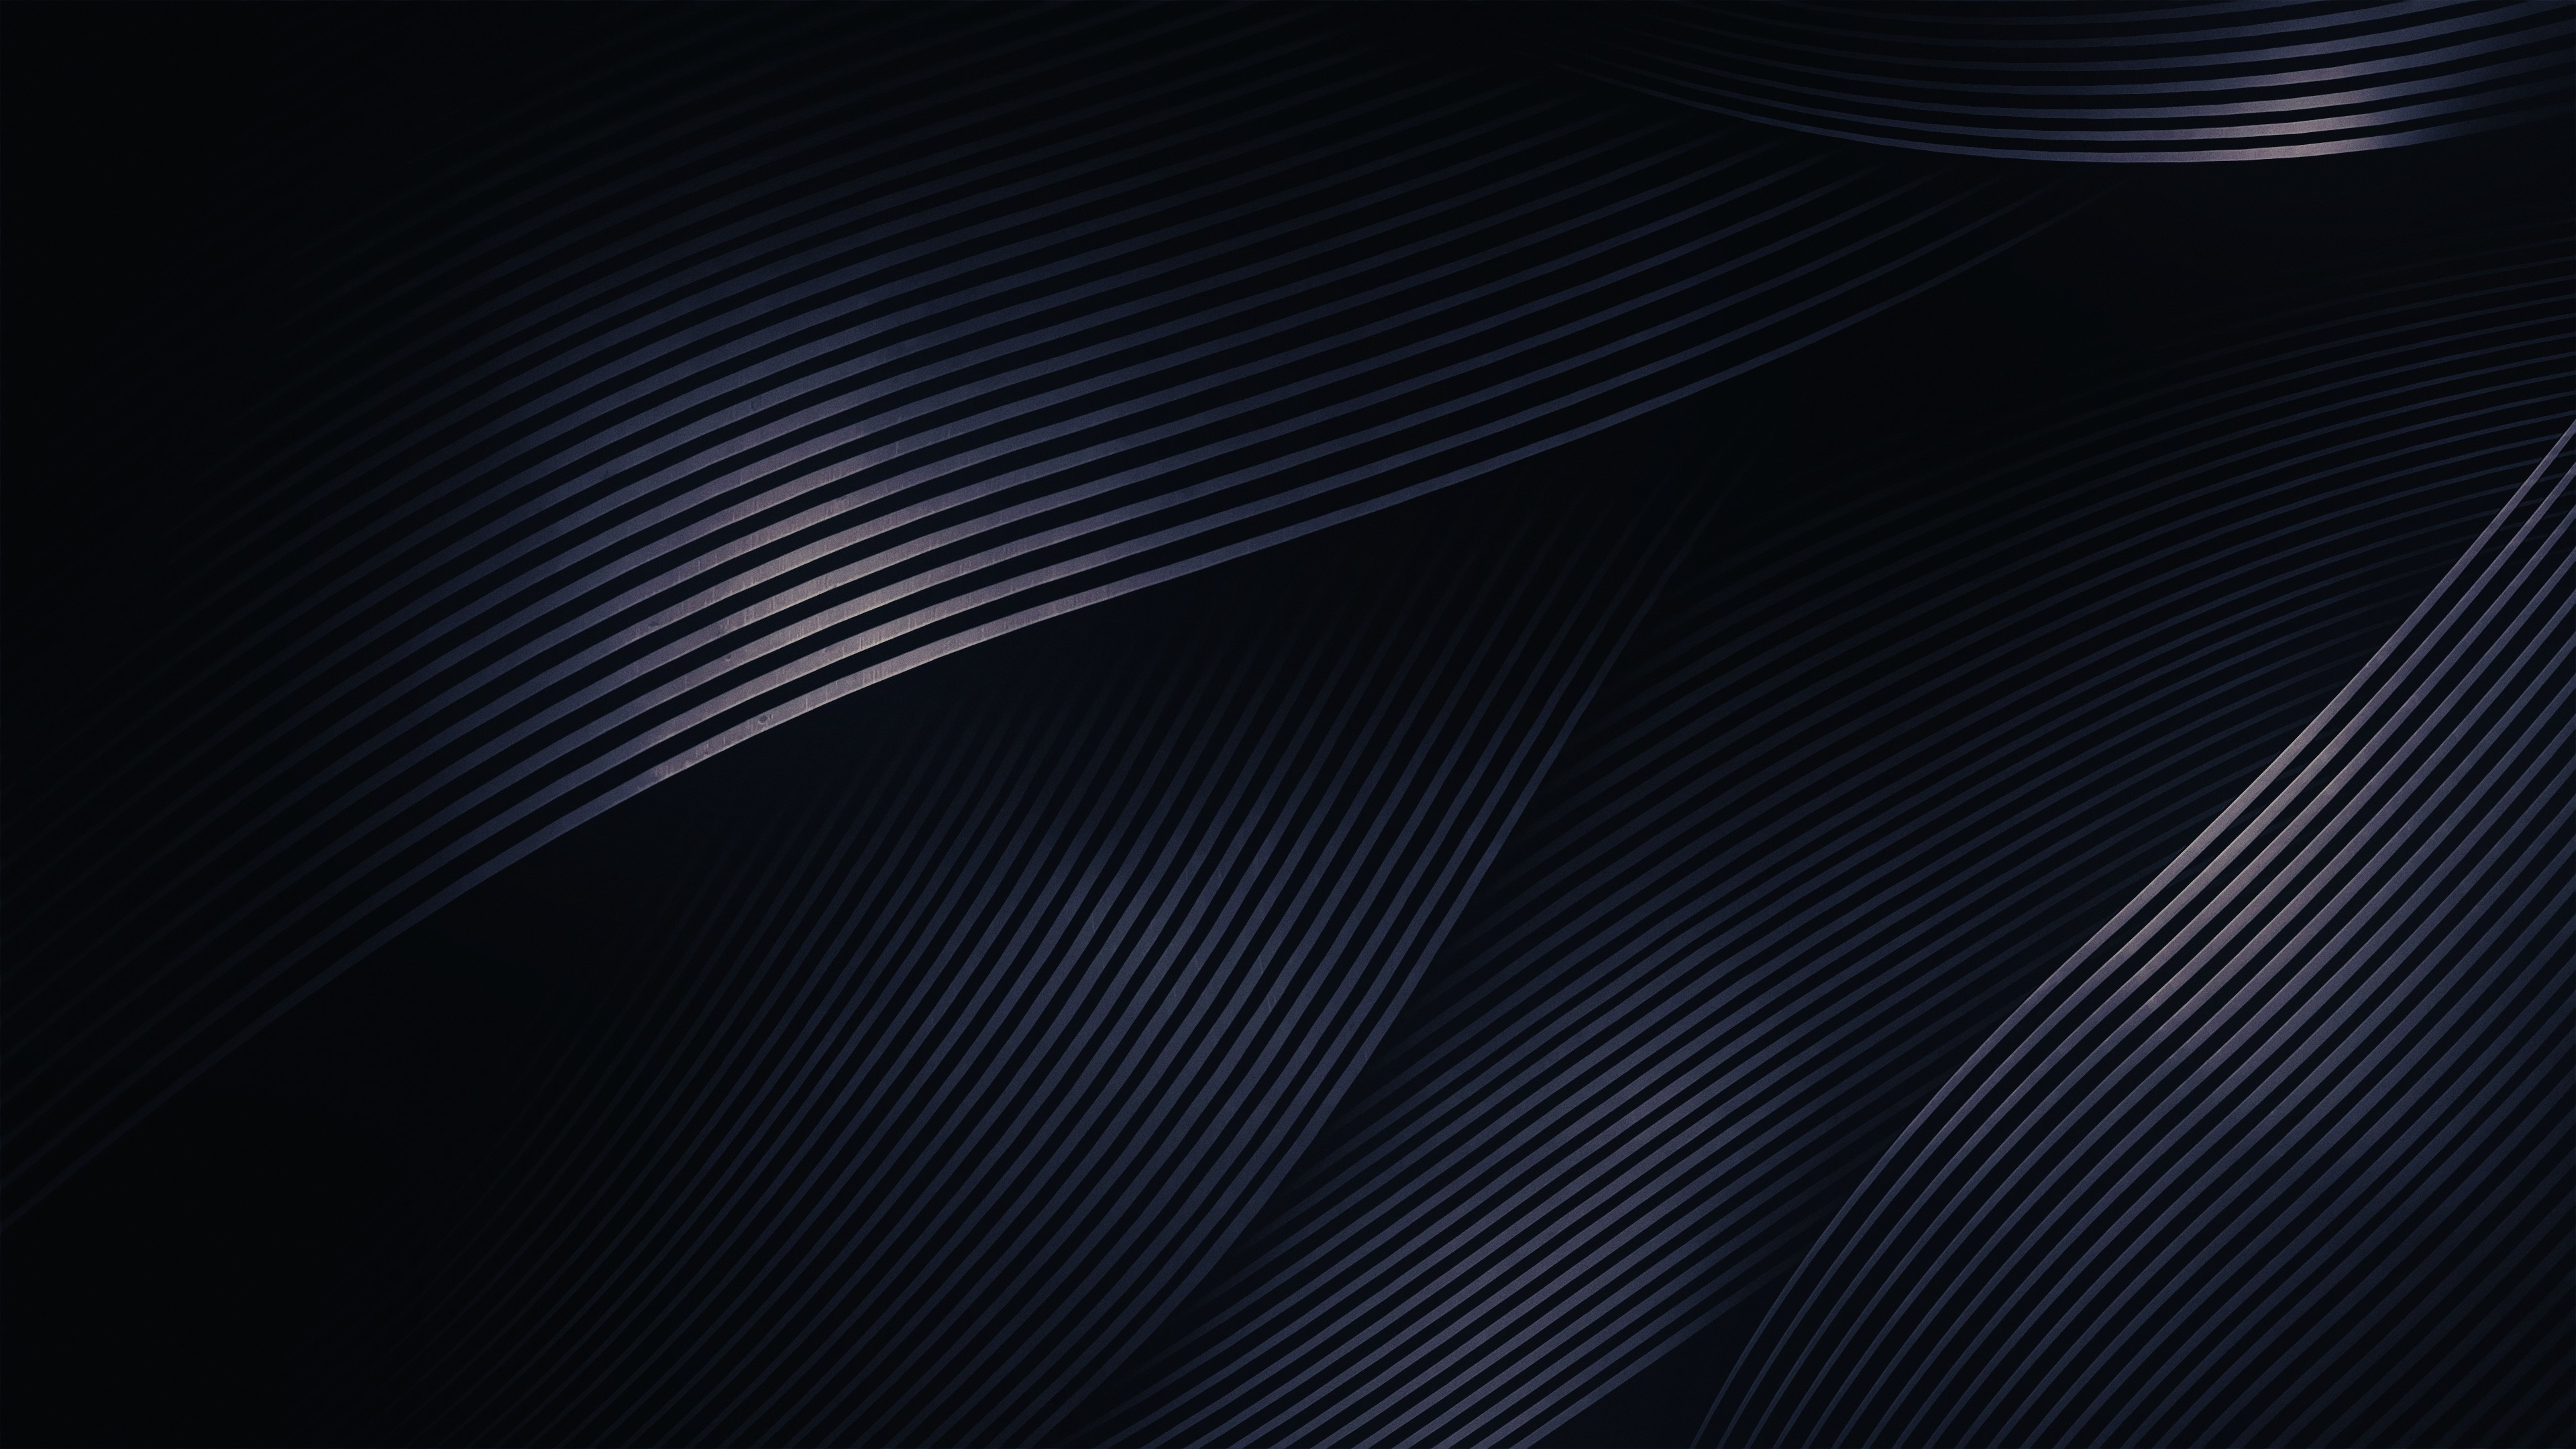 Black Wallpaper Texture 77 Images